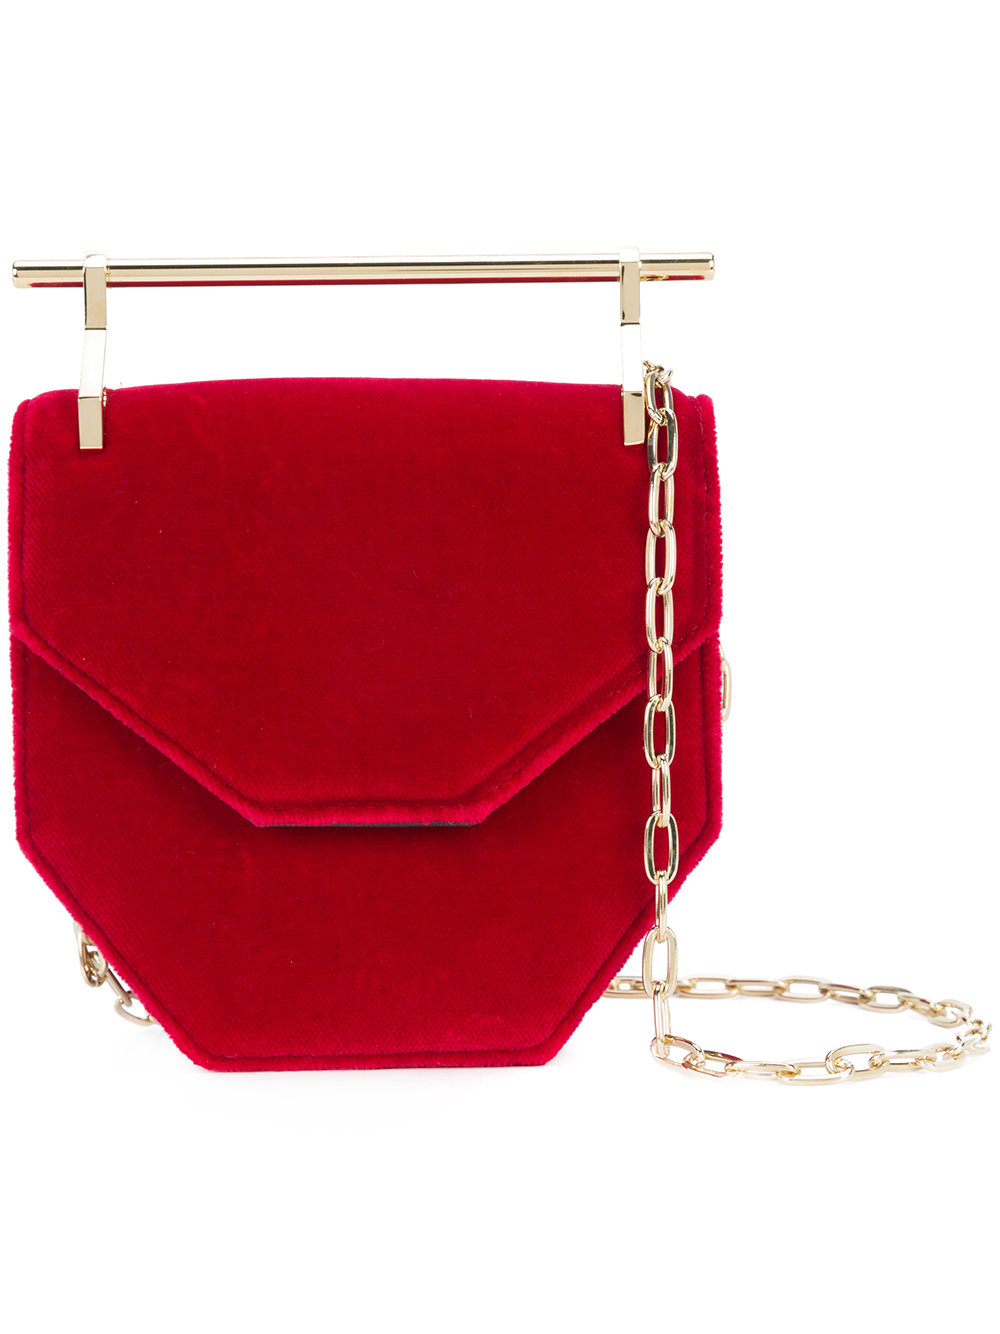 M2MALLETIER bag - $1,125